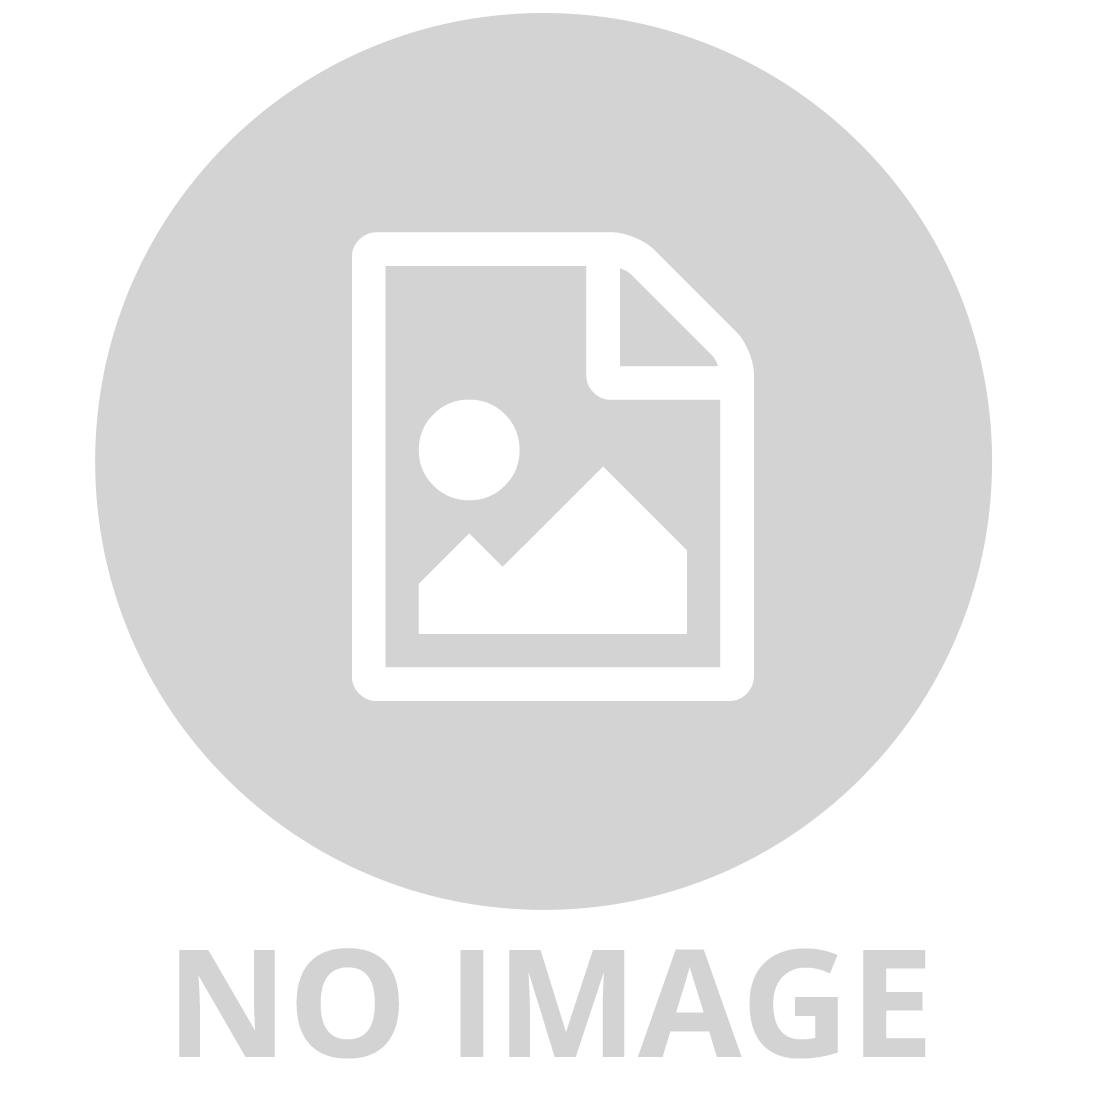 B ME CRAFTY 3500 BEADS